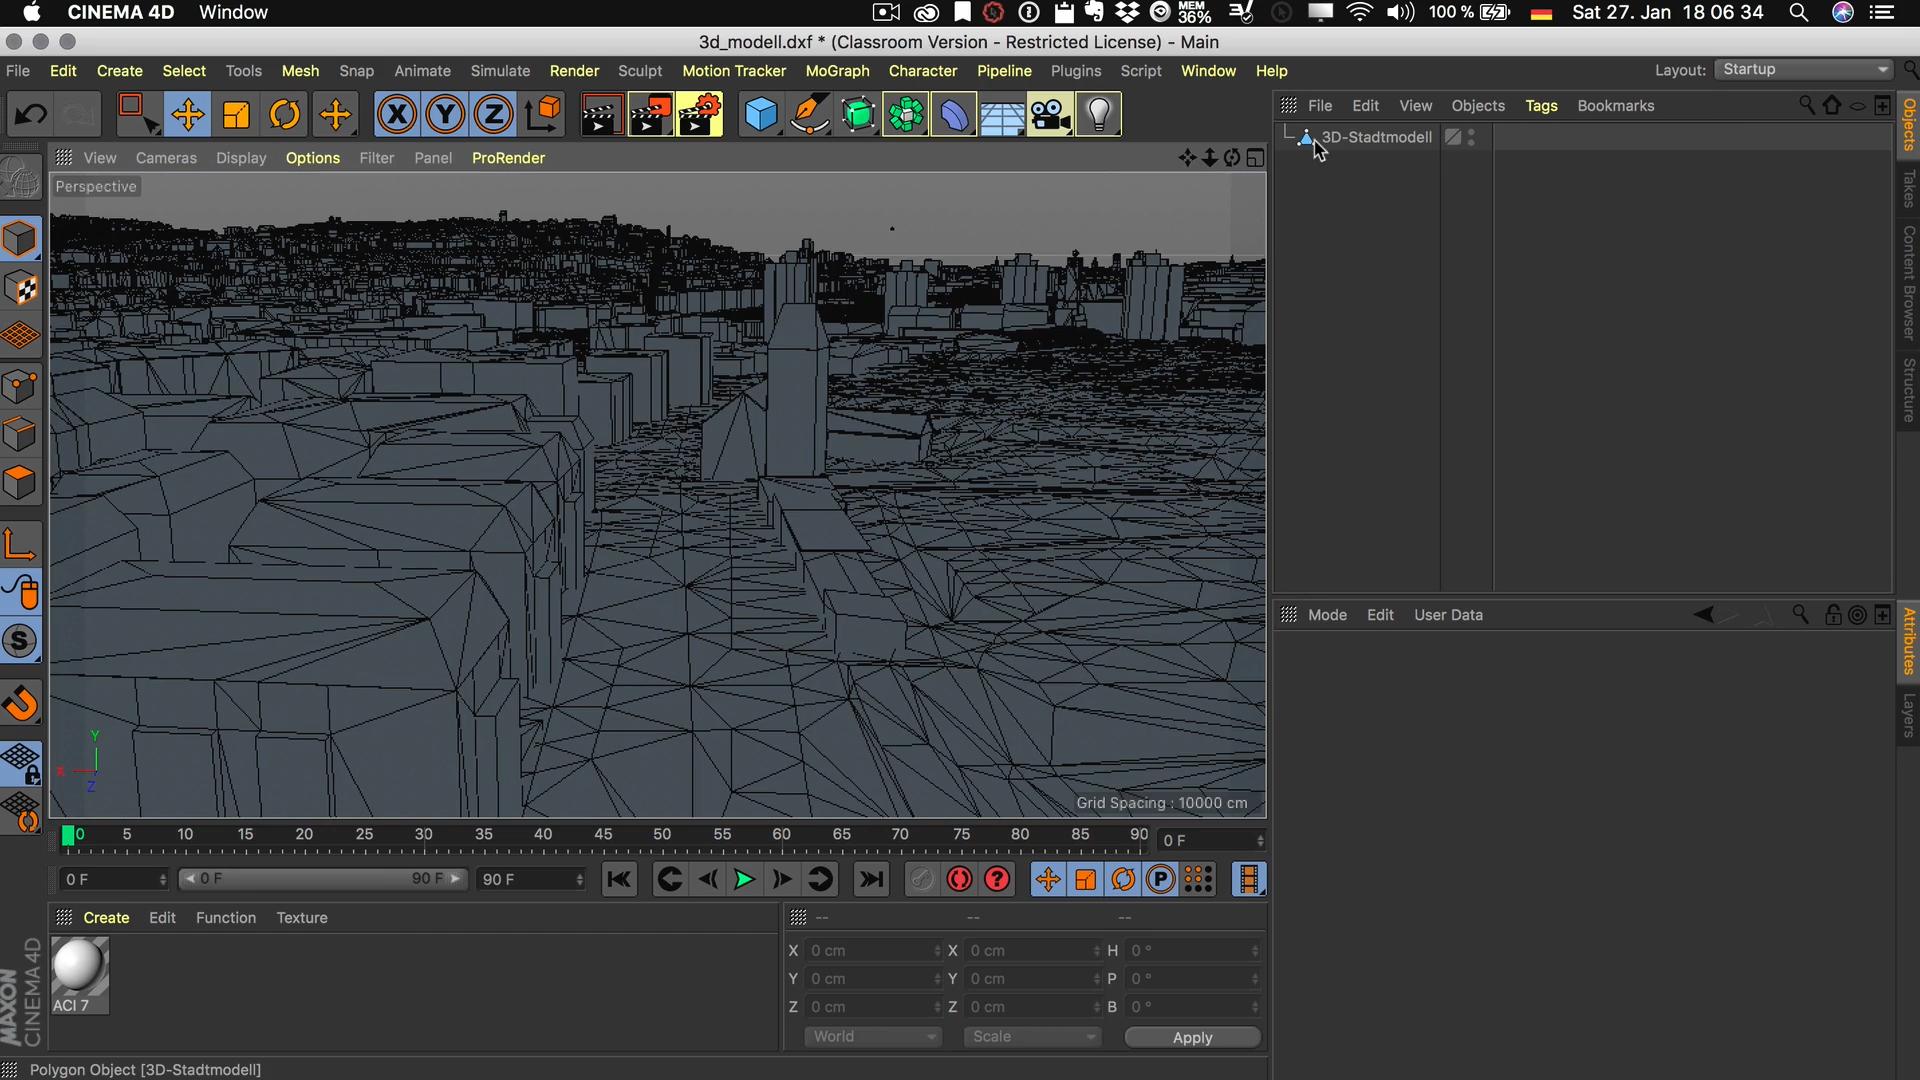 Cinema4D 3D-Stadtmodell Viewport Editor Display Darstellung Constant Shading Konstant Linien Lines